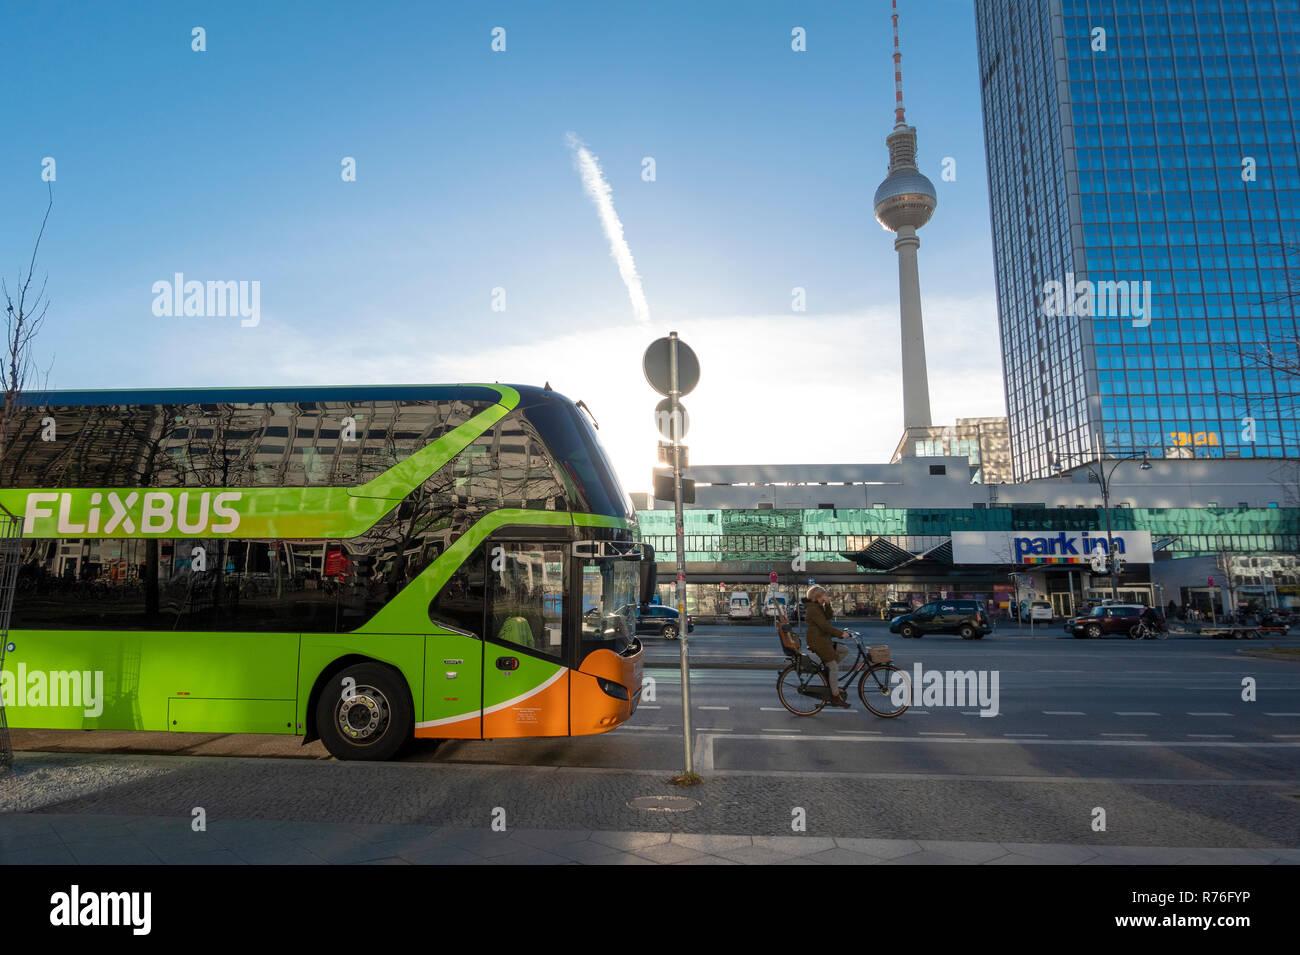 Flixbus de ônibus de longa distância ônibus de Alexandersrasse de Berlim, com a torre de televisão de Berlim Berlin Fernsehturm na Alexanderplatz, Torre Fernseh Imagens de Stock